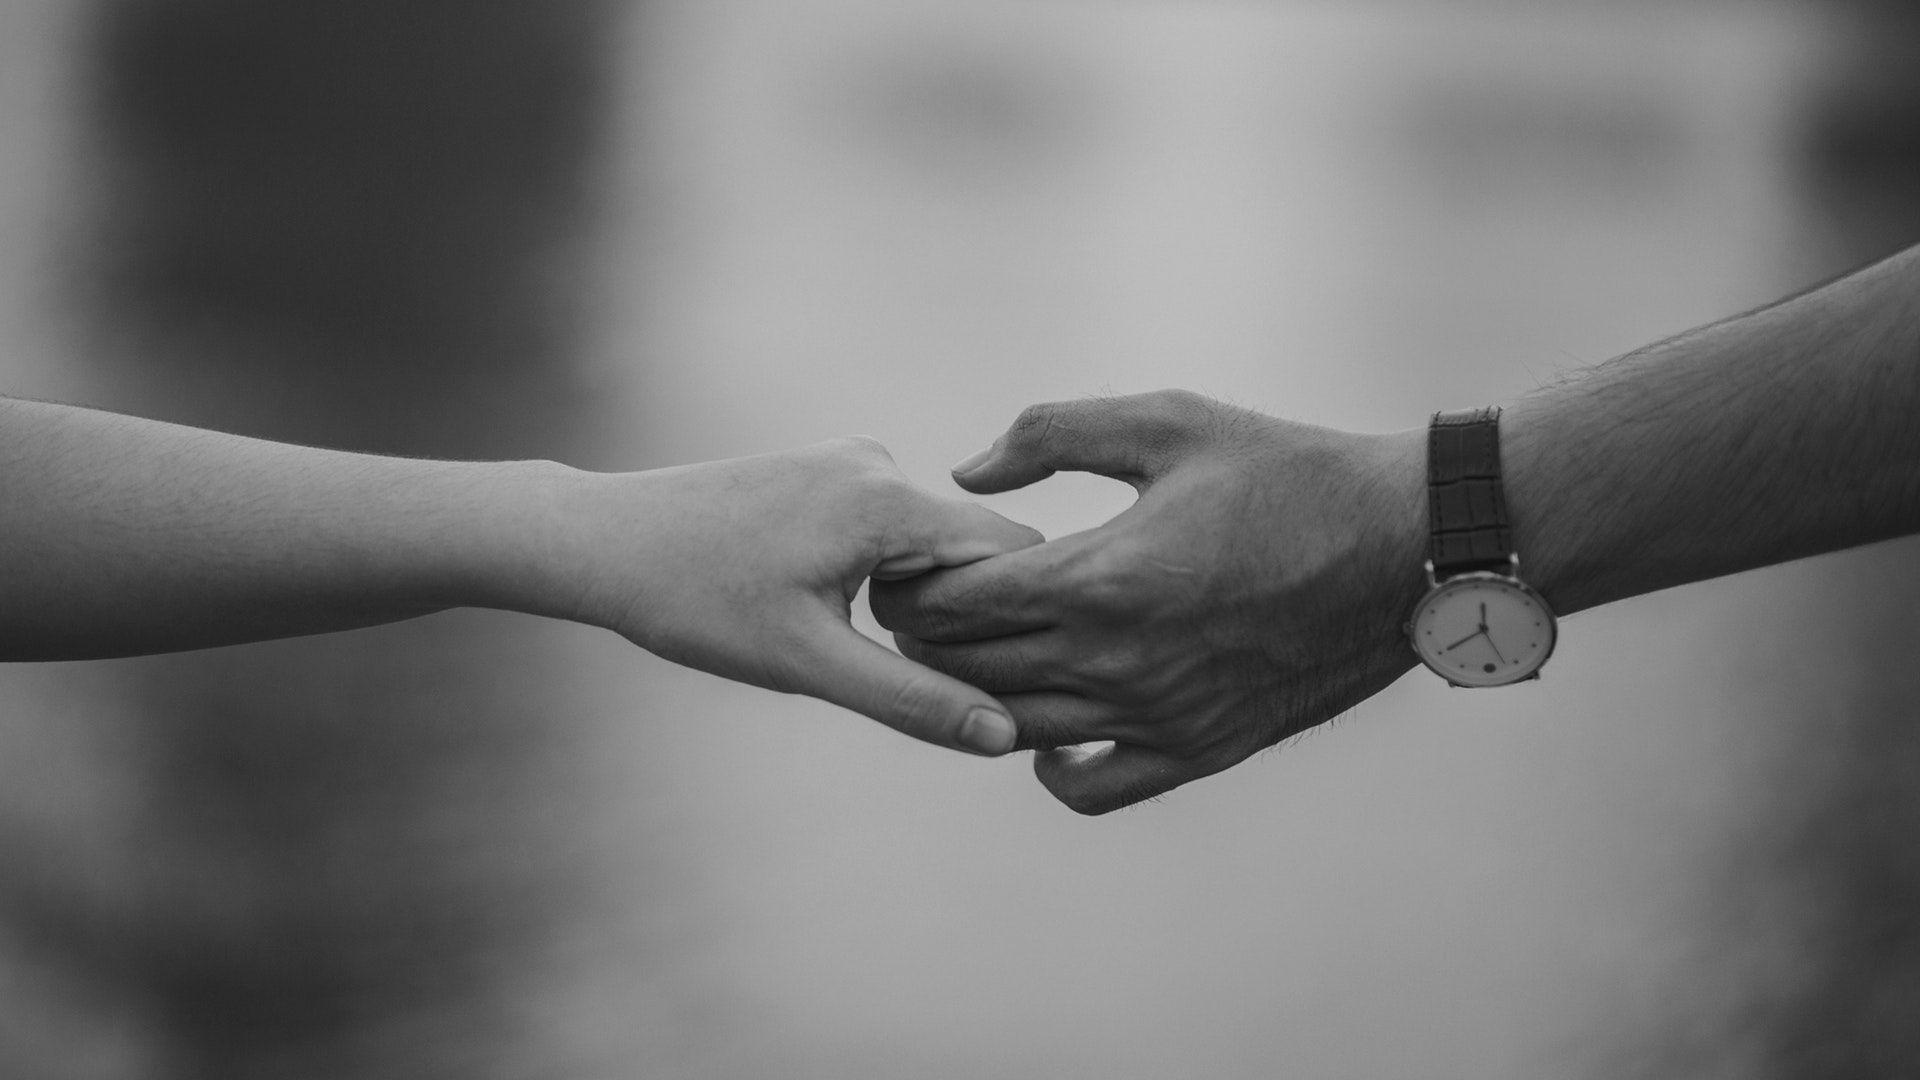 عکس زمینه دست در دست هم عاشقانه پس زمینه | والپیپر گرام